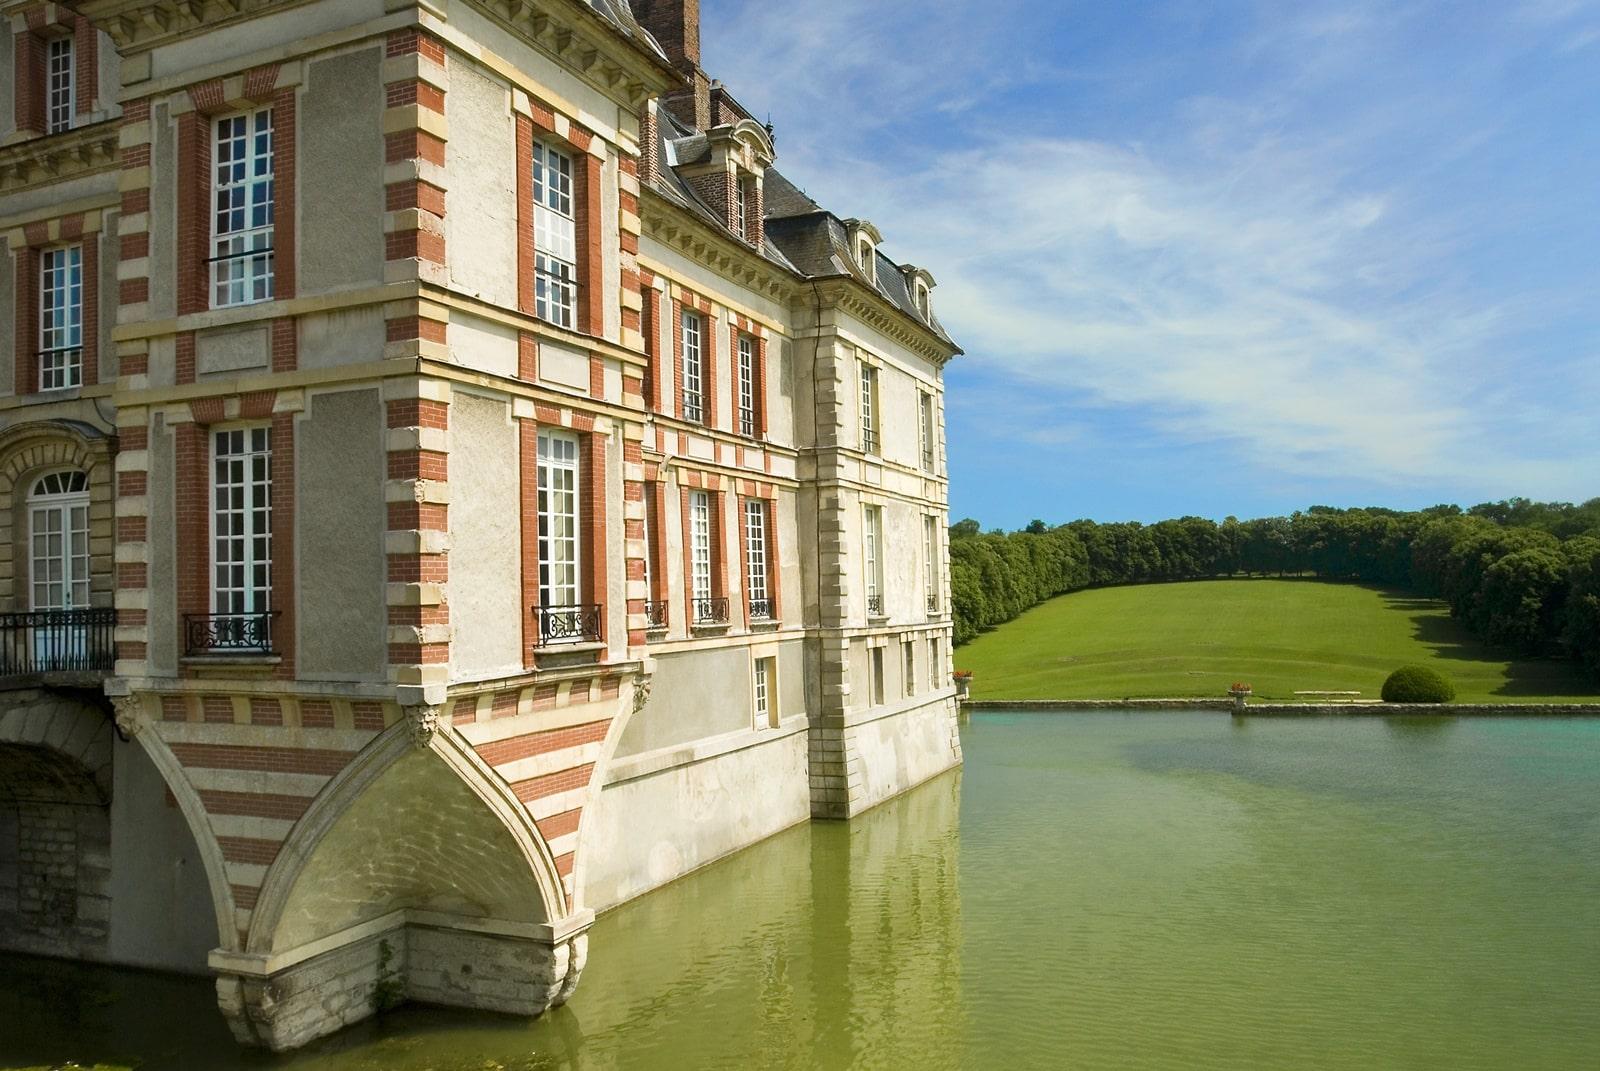 Chateau-Ormesson-4